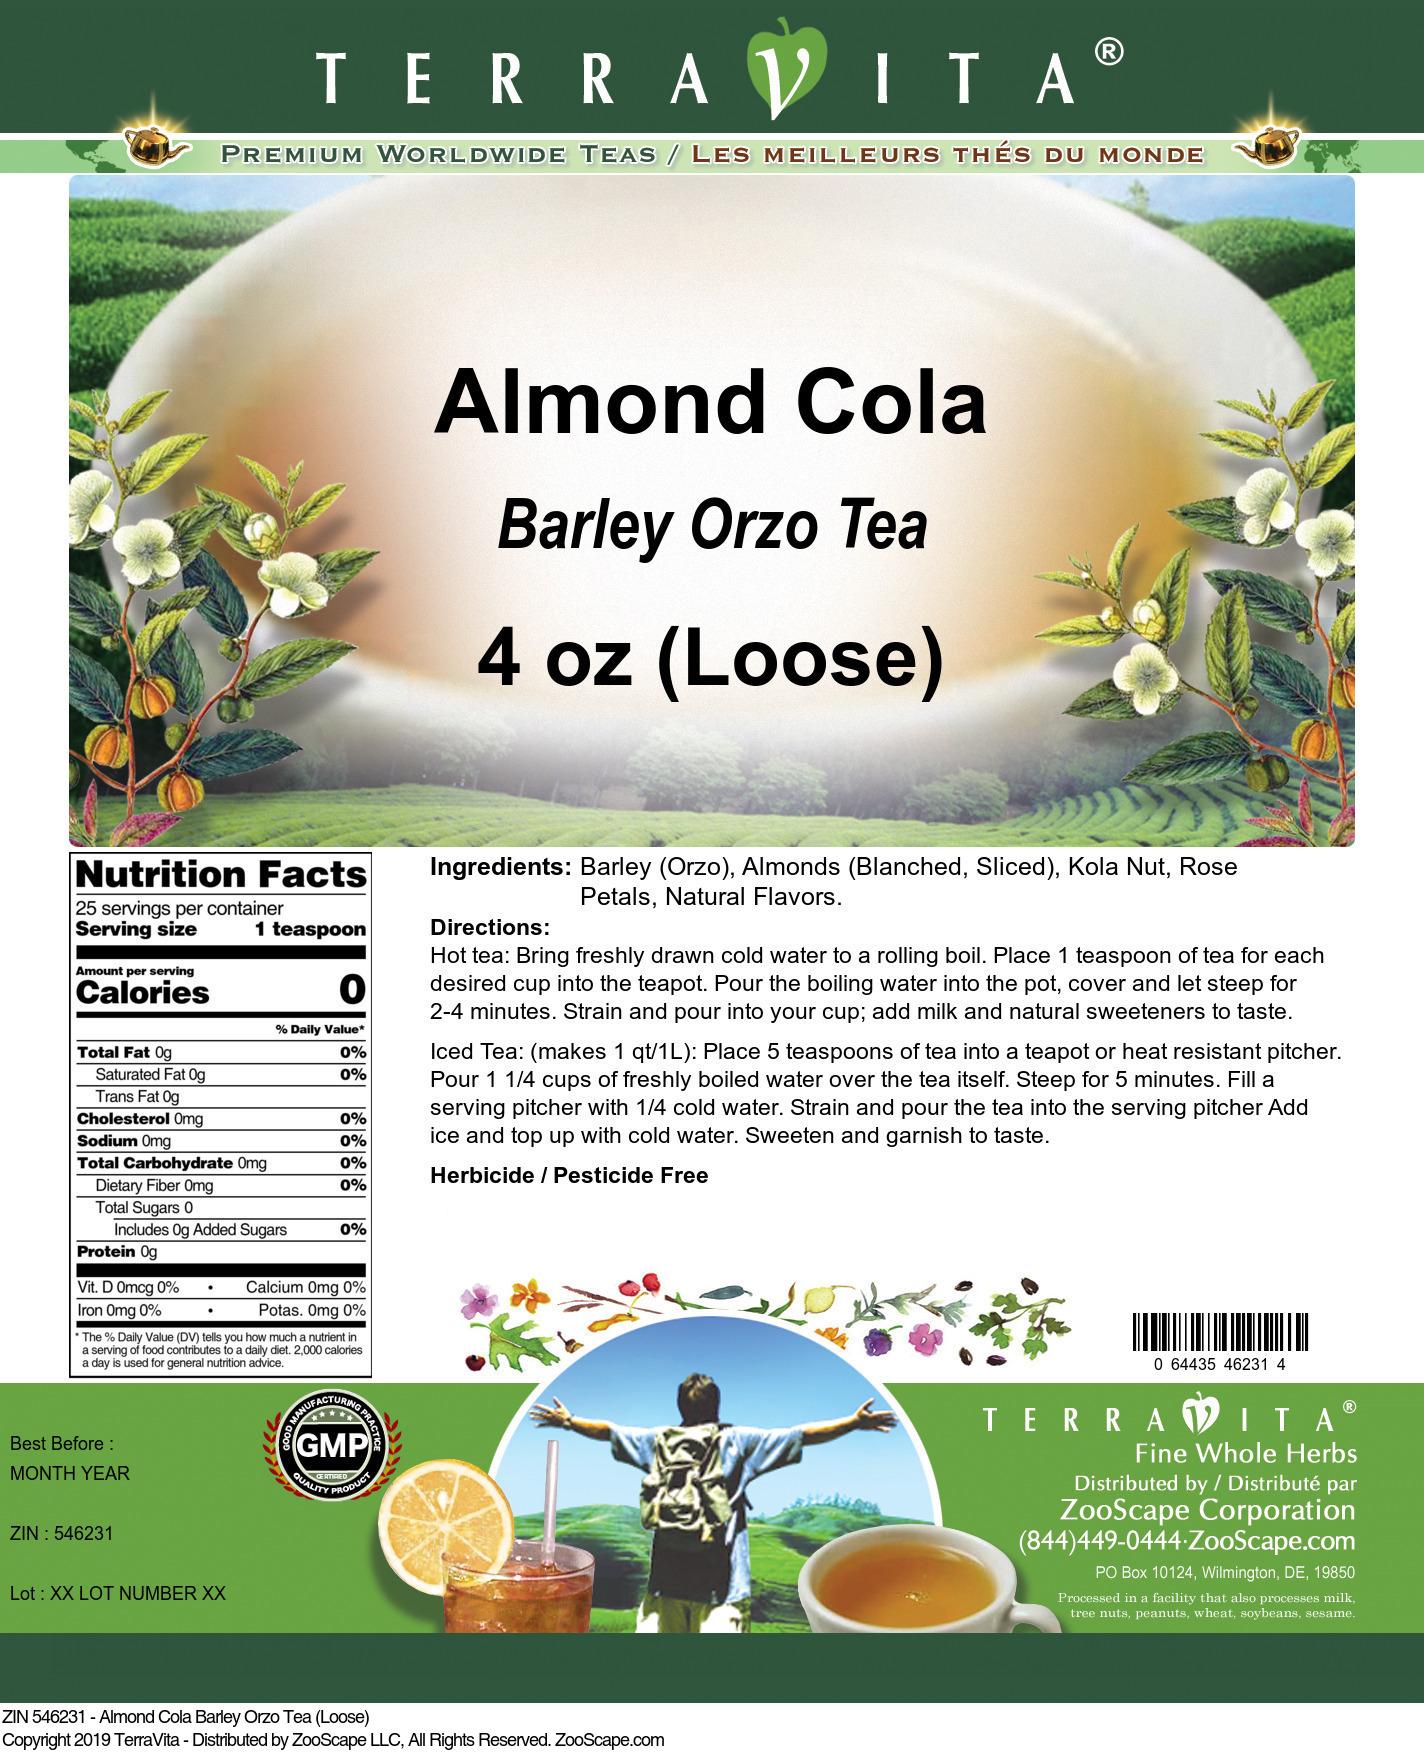 Almond Cola Barley Orzo Tea (Loose)